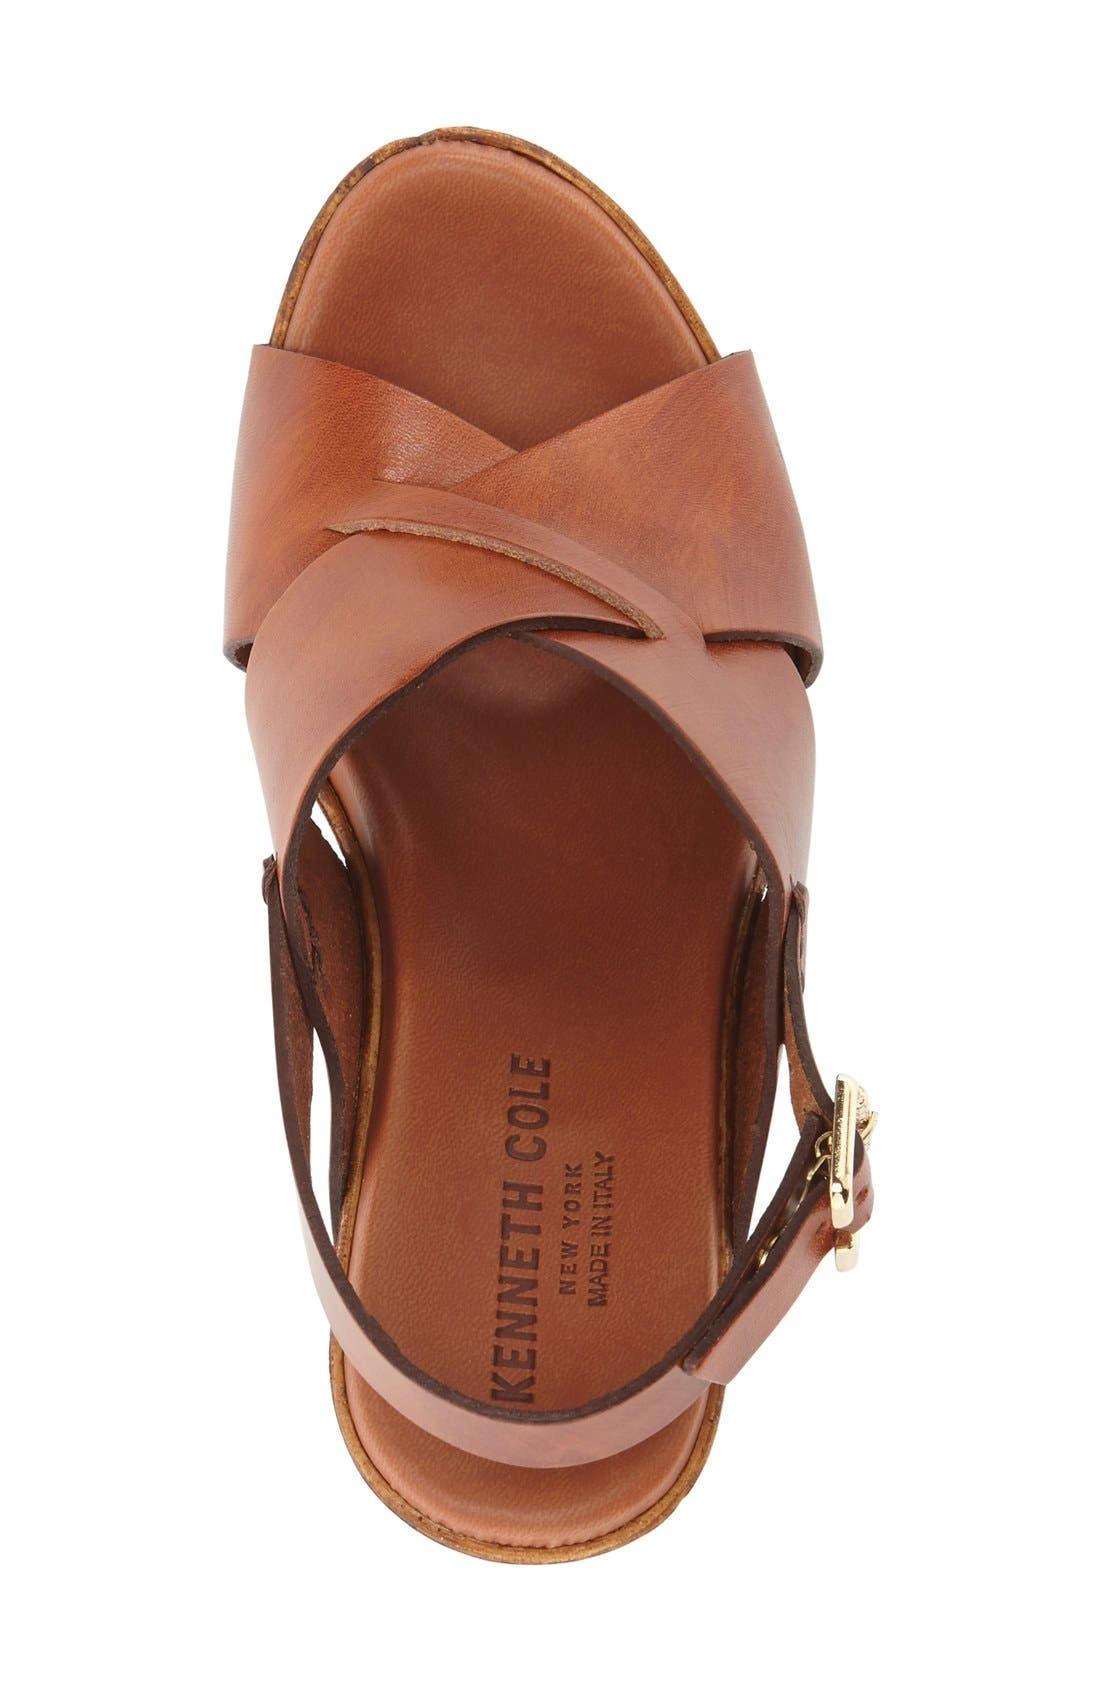 Alternate Image 3  - Kenneth Cole New York 'Belle' Platform Sandal (Women)